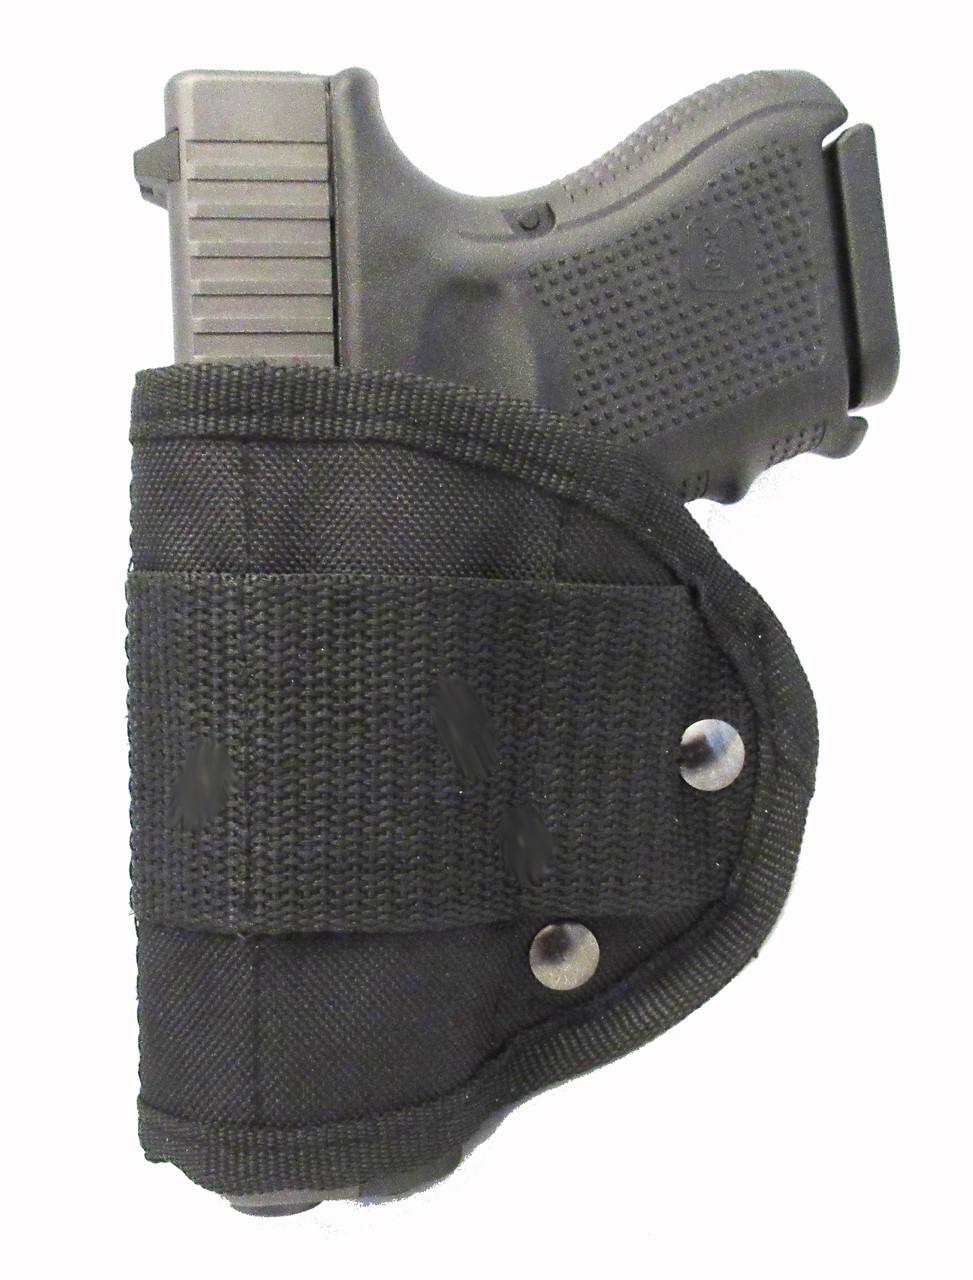 Inside Waistband Poly Sling Holster Fits Glock 26 27 28 29 30 33 39 IWB (M2)